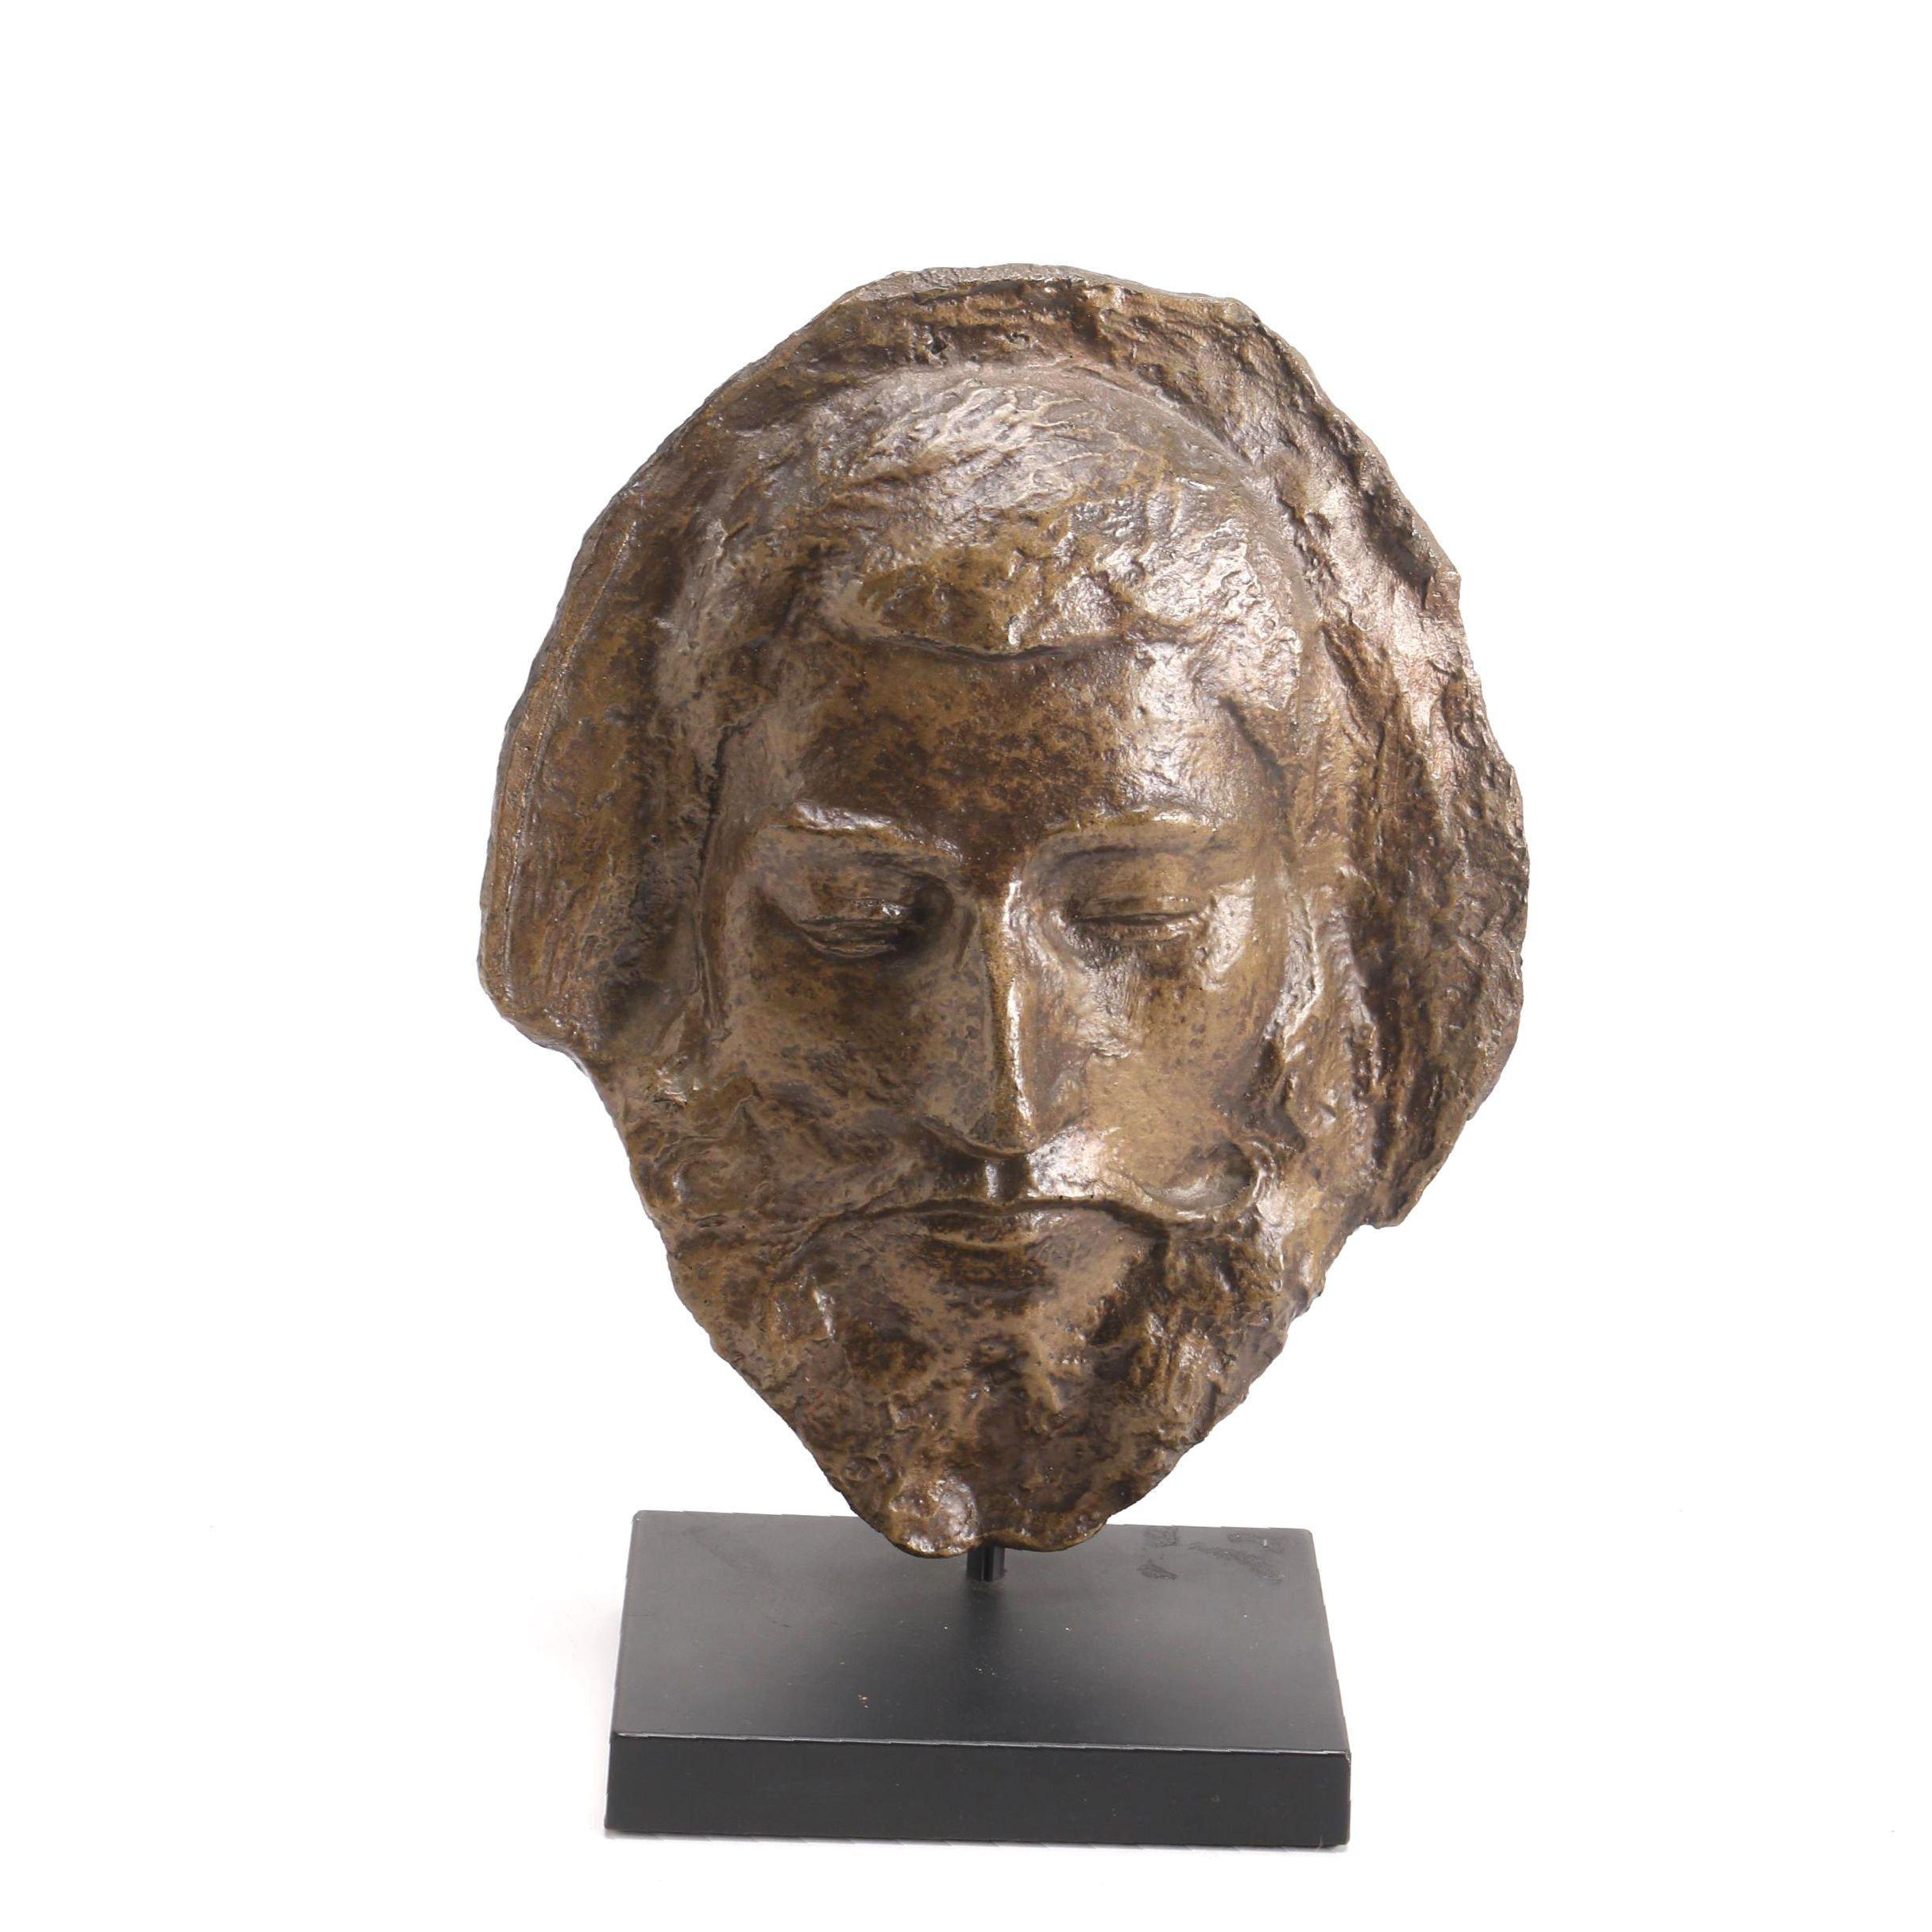 Ceramic Sculpture of Male Face